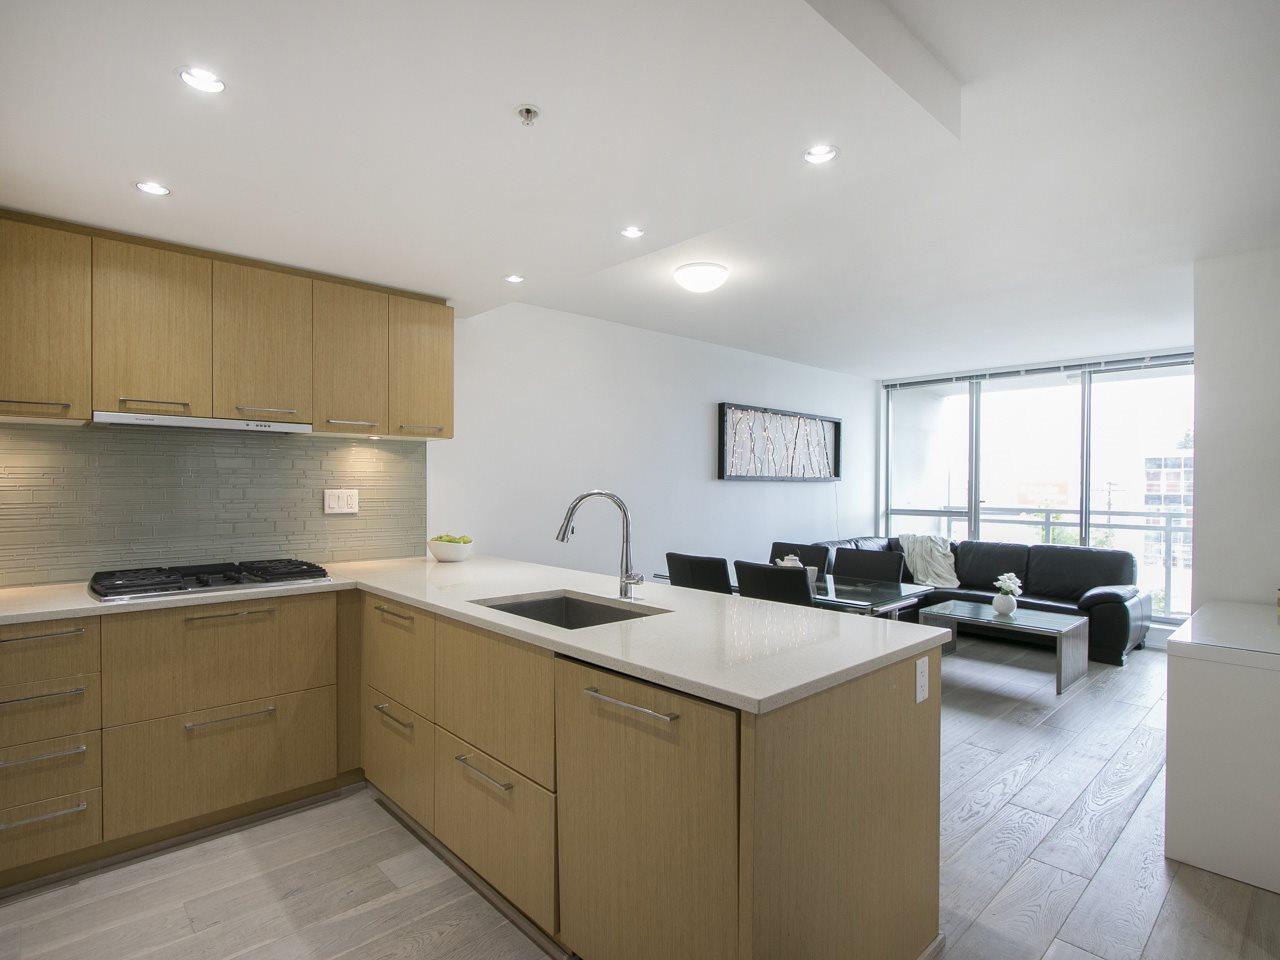 Condo Apartment at 310 1680 W 4TH AVENUE, Unit 310, Vancouver West, British Columbia. Image 2